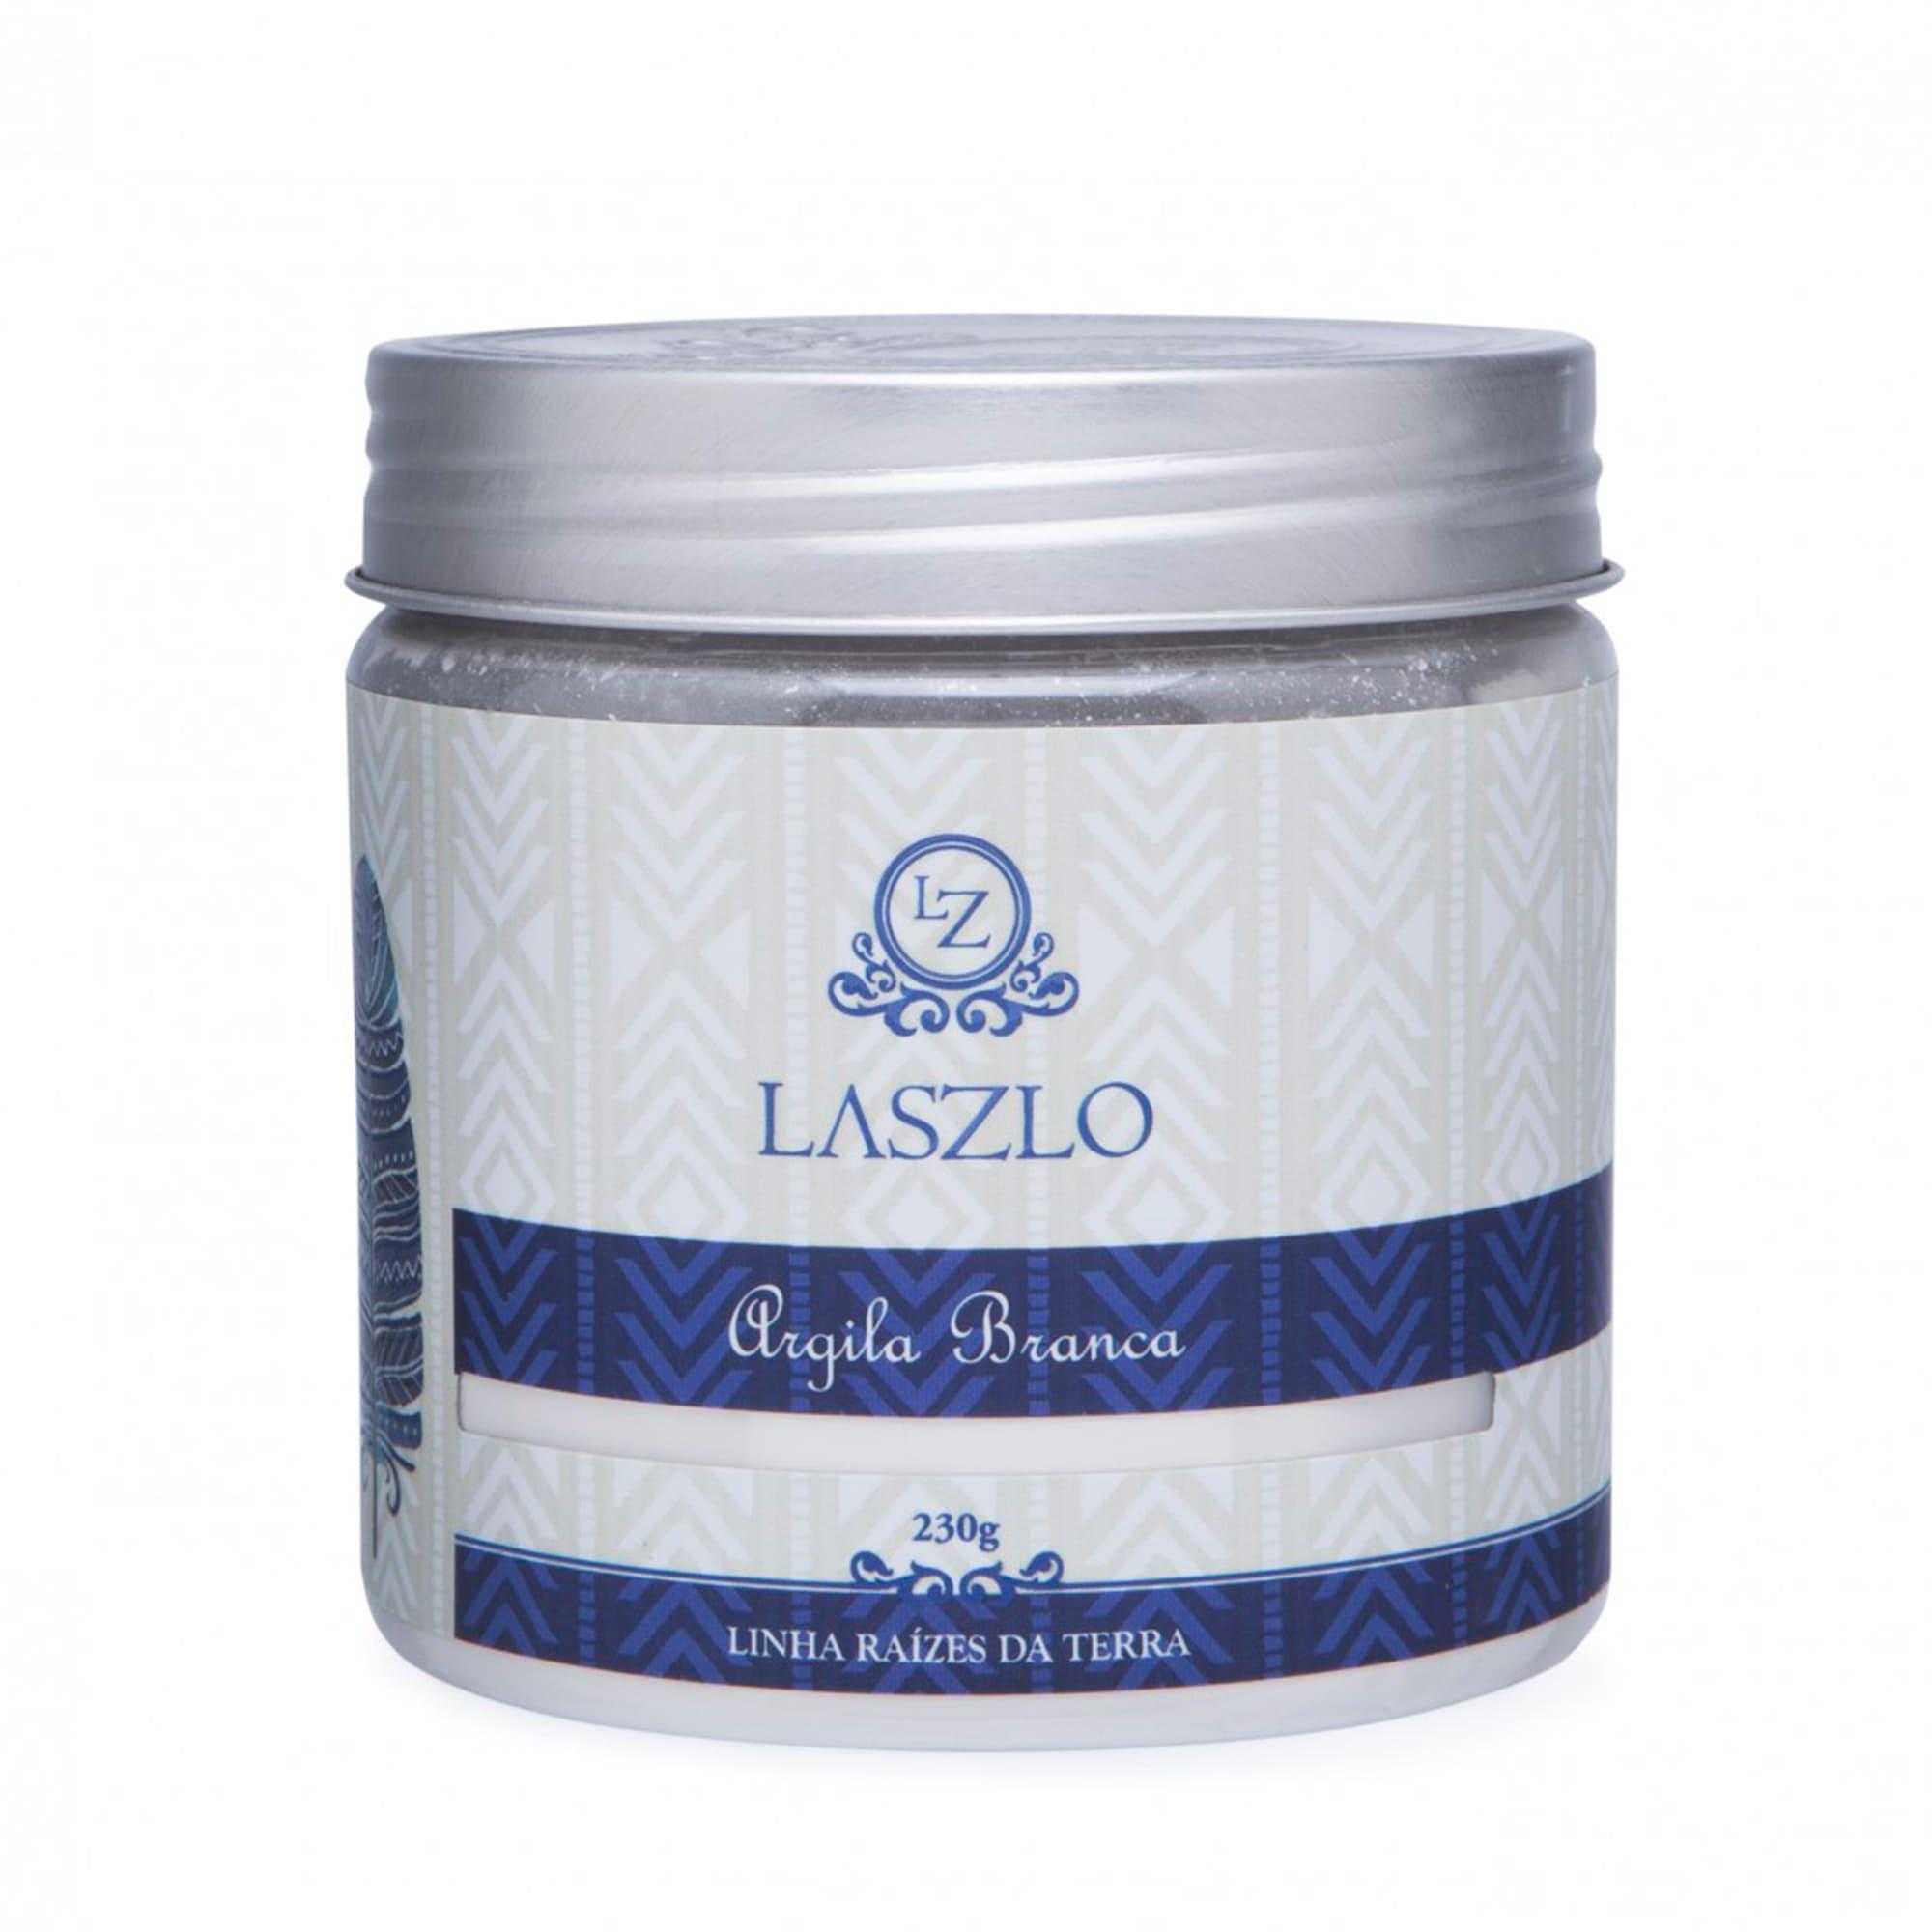 Argila Branca 230g - Laslzo